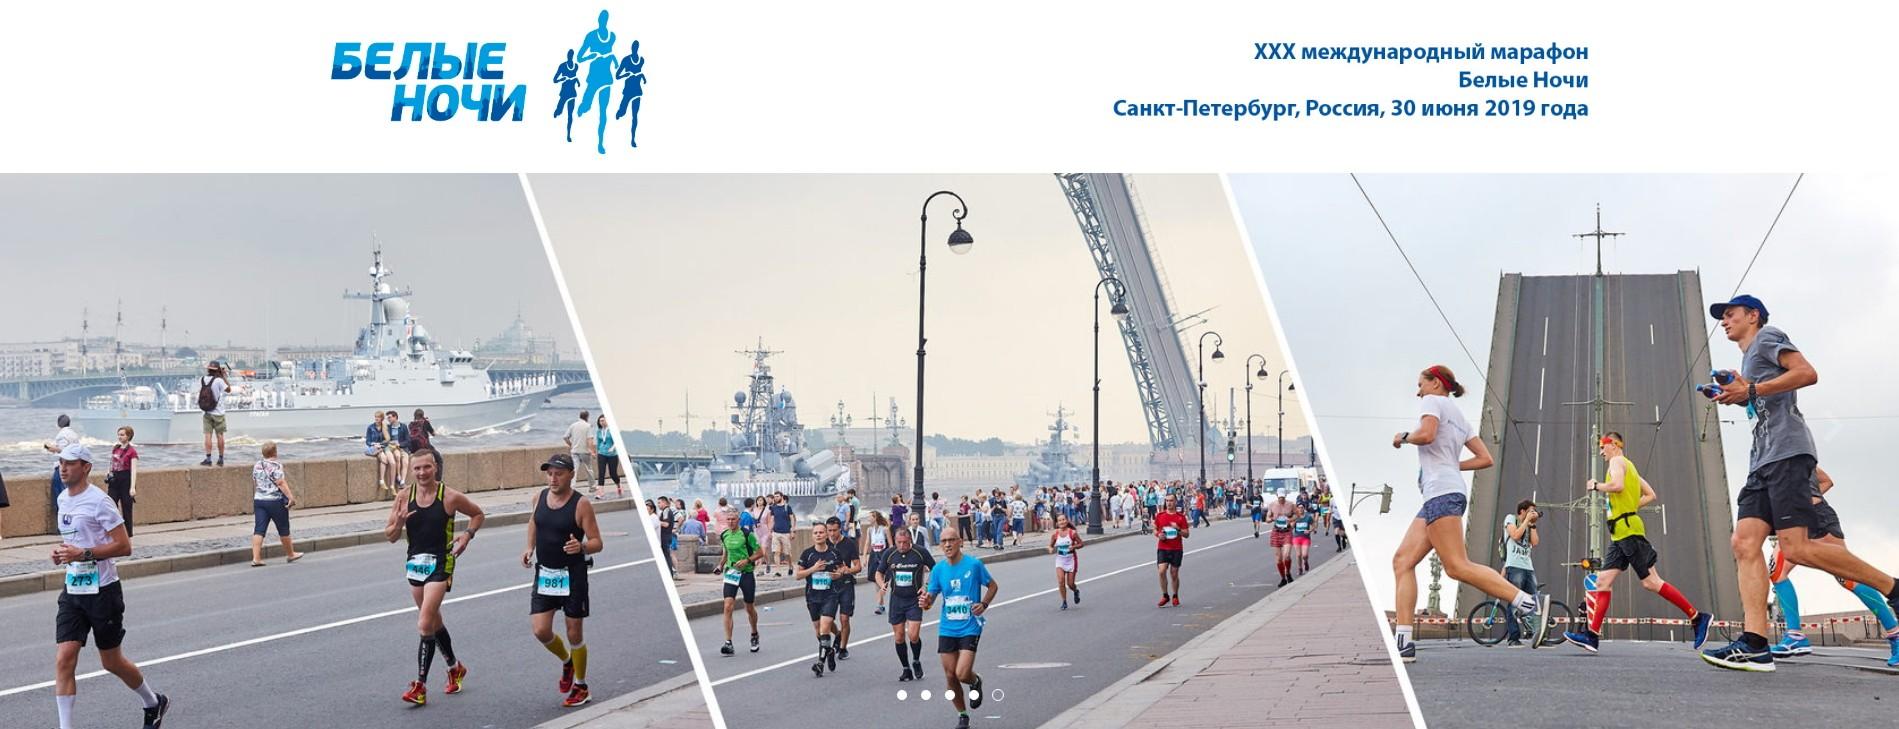 марафон белые ночи санкт-петербург